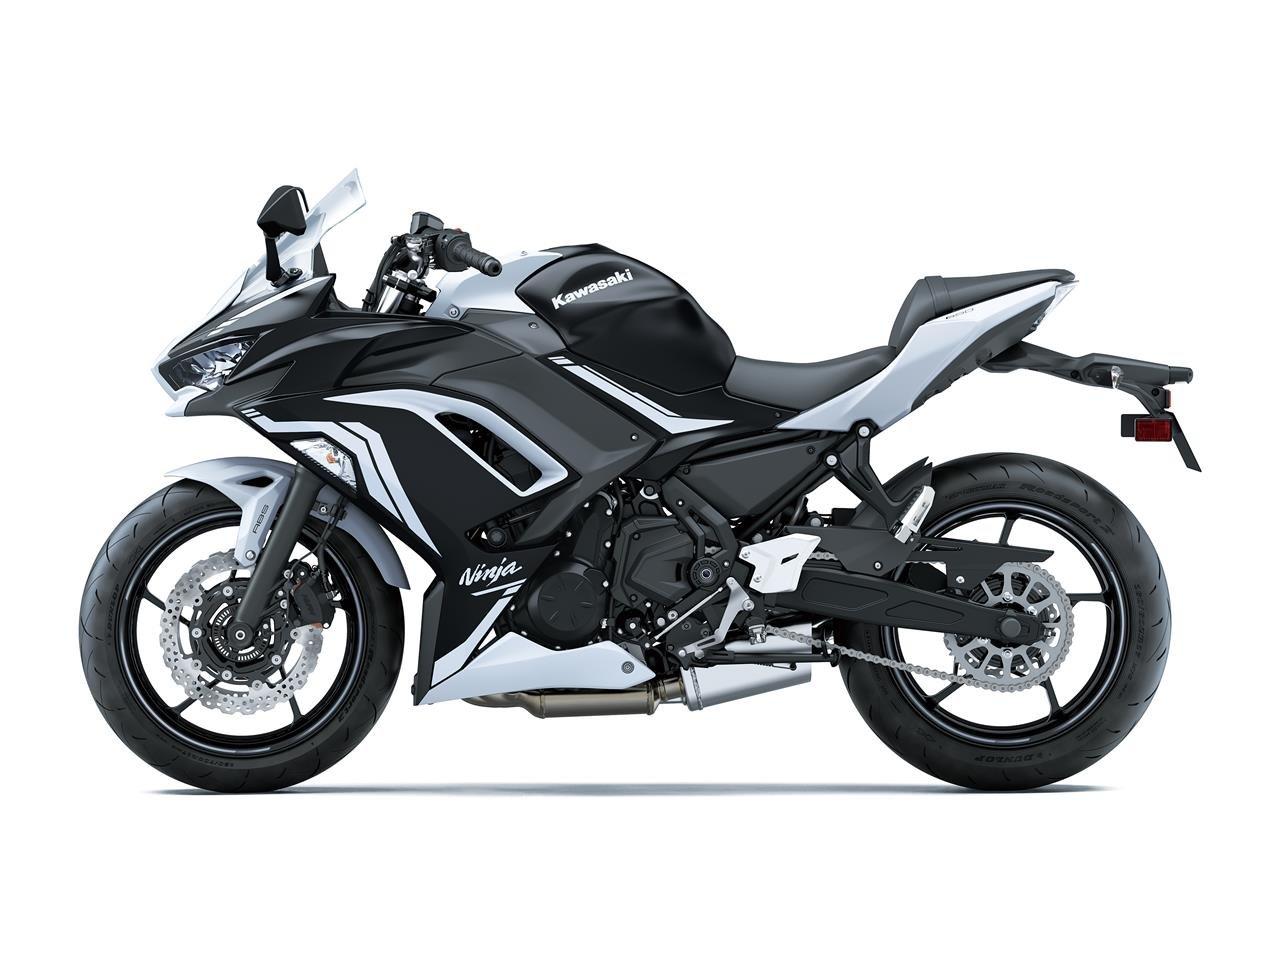 New 2020 Kawasaki Ninja 650 ABS SE *£99 Deposit 0% APR* For Sale (picture 3 of 6)